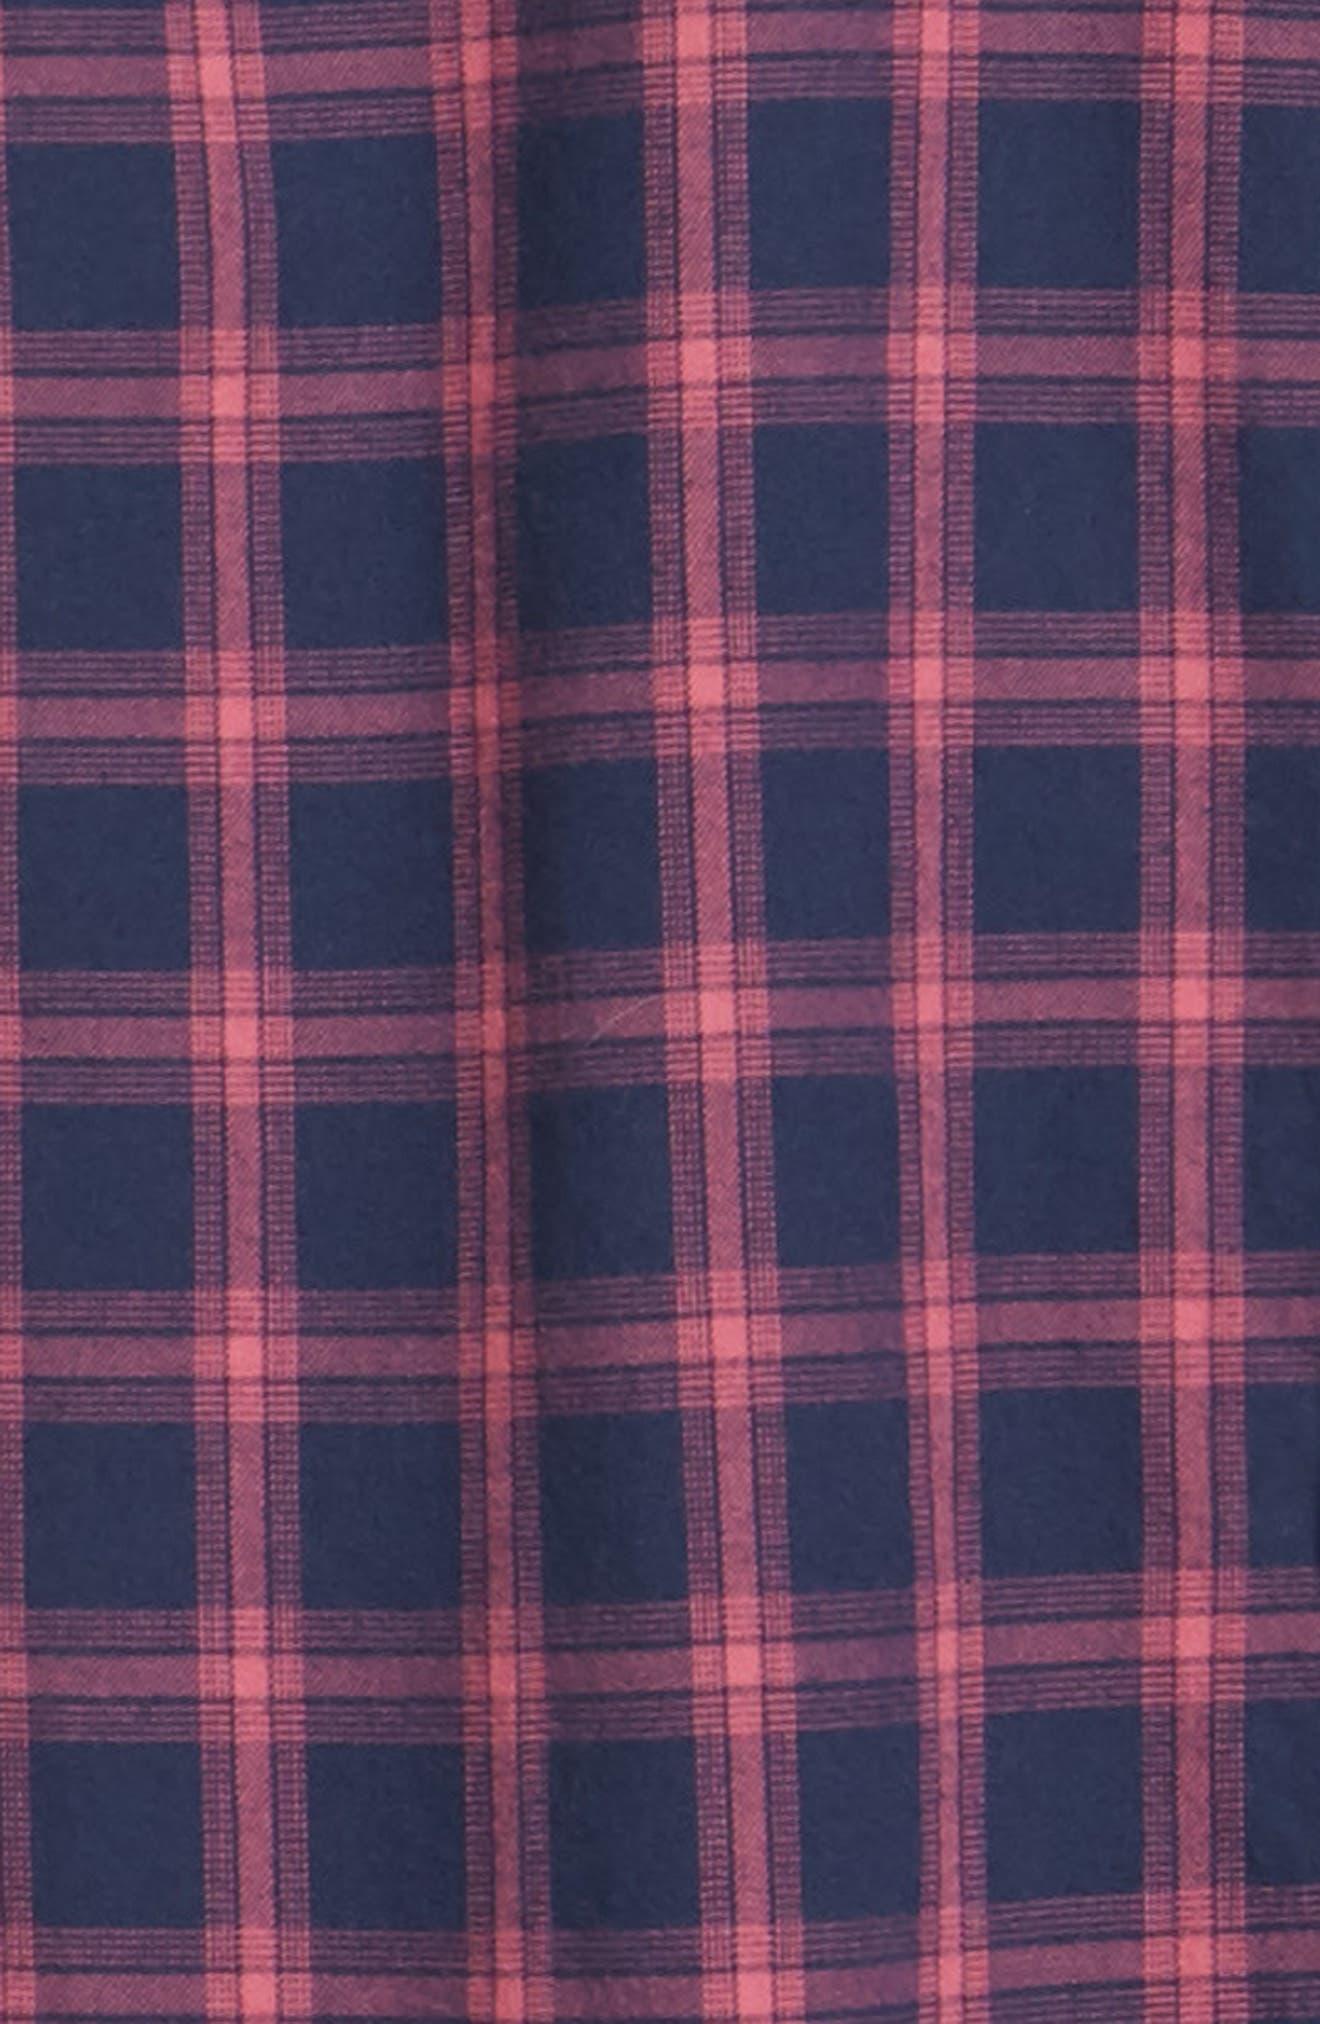 Slim Fit Brushed Twill Sport Shirt,                             Alternate thumbnail 6, color,                             ELLIS CHECK - MALAGA